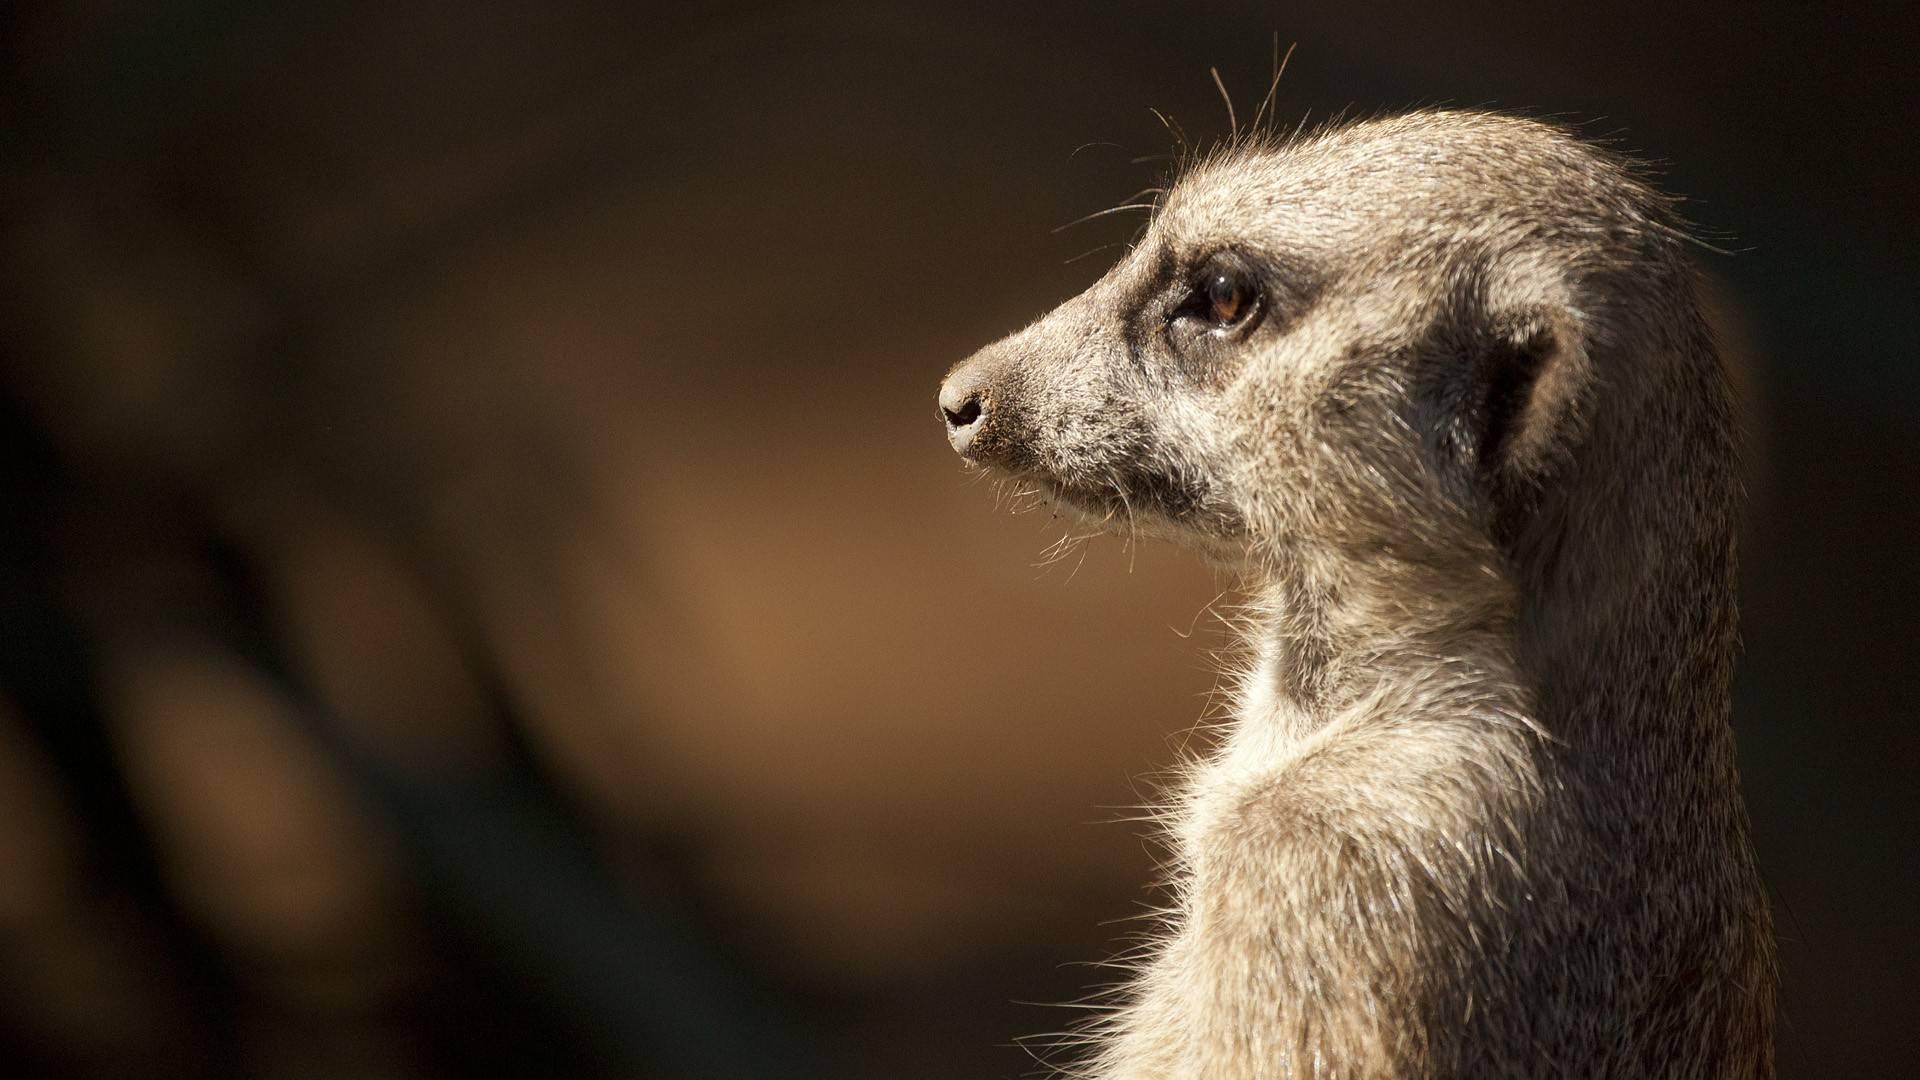 meerkat pic - HD Desktop Wallpapers | 4k HD